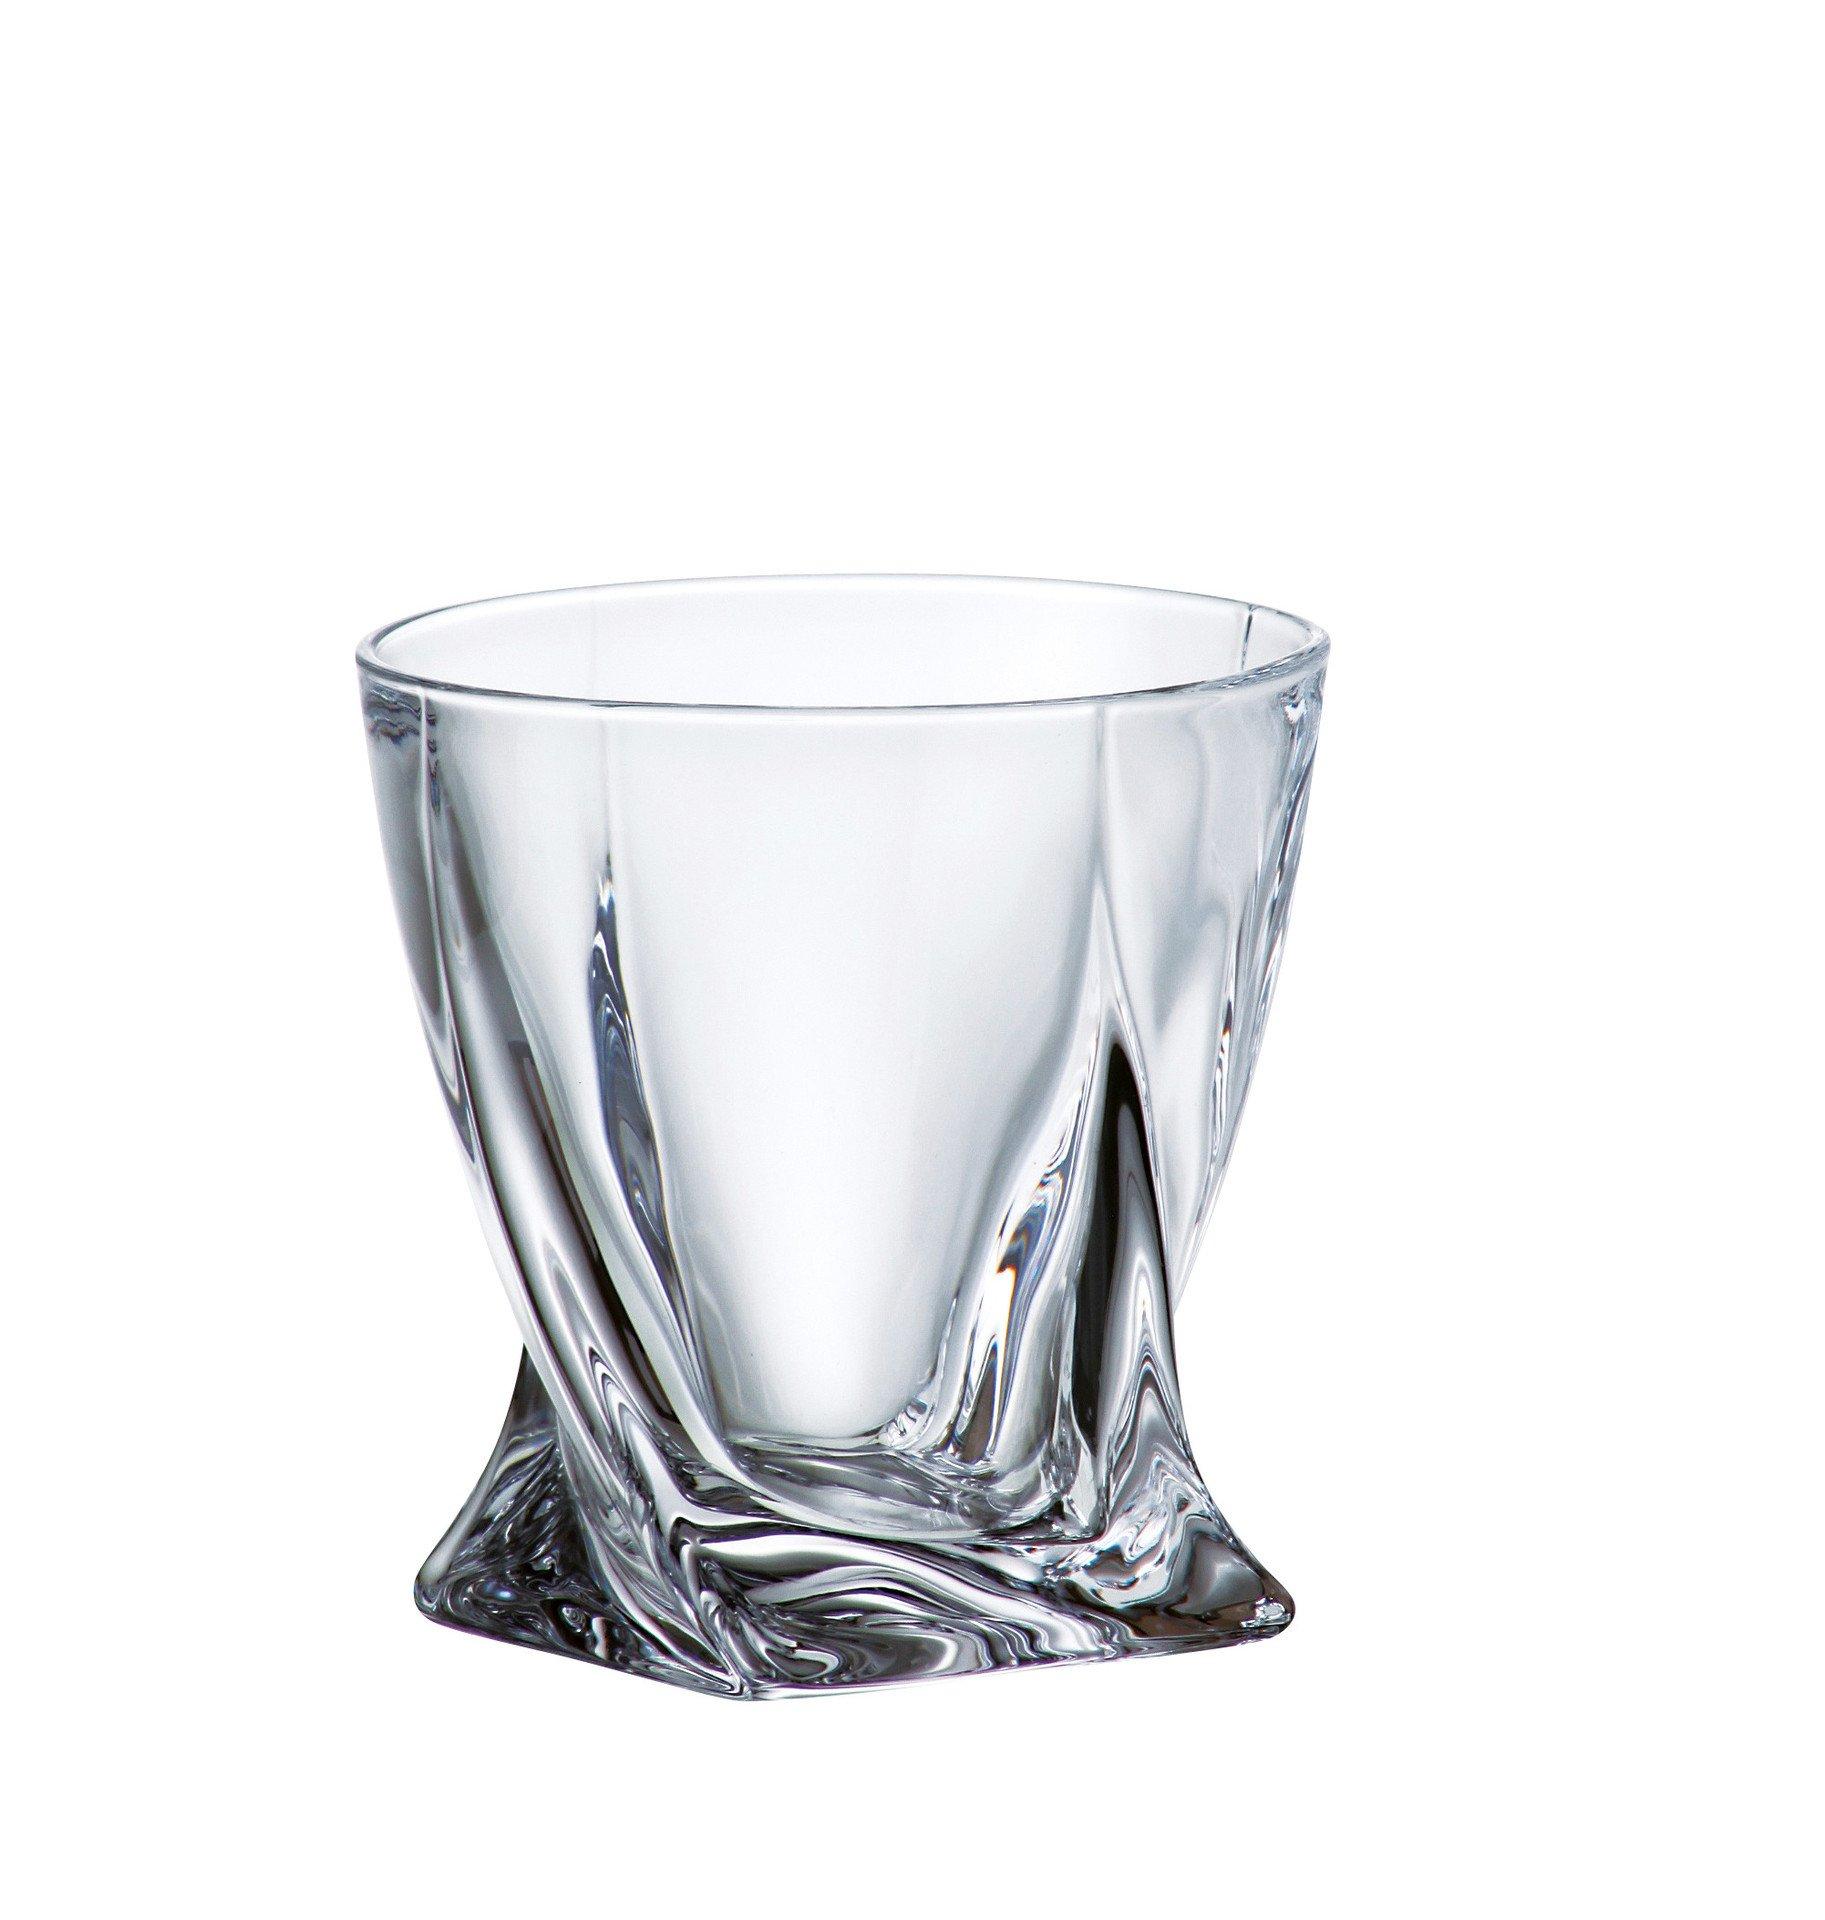 Barski Glass- Lead Free Crystalline - Shot Glasses - 1.85 oz. - Made in Europe - Set Of 6